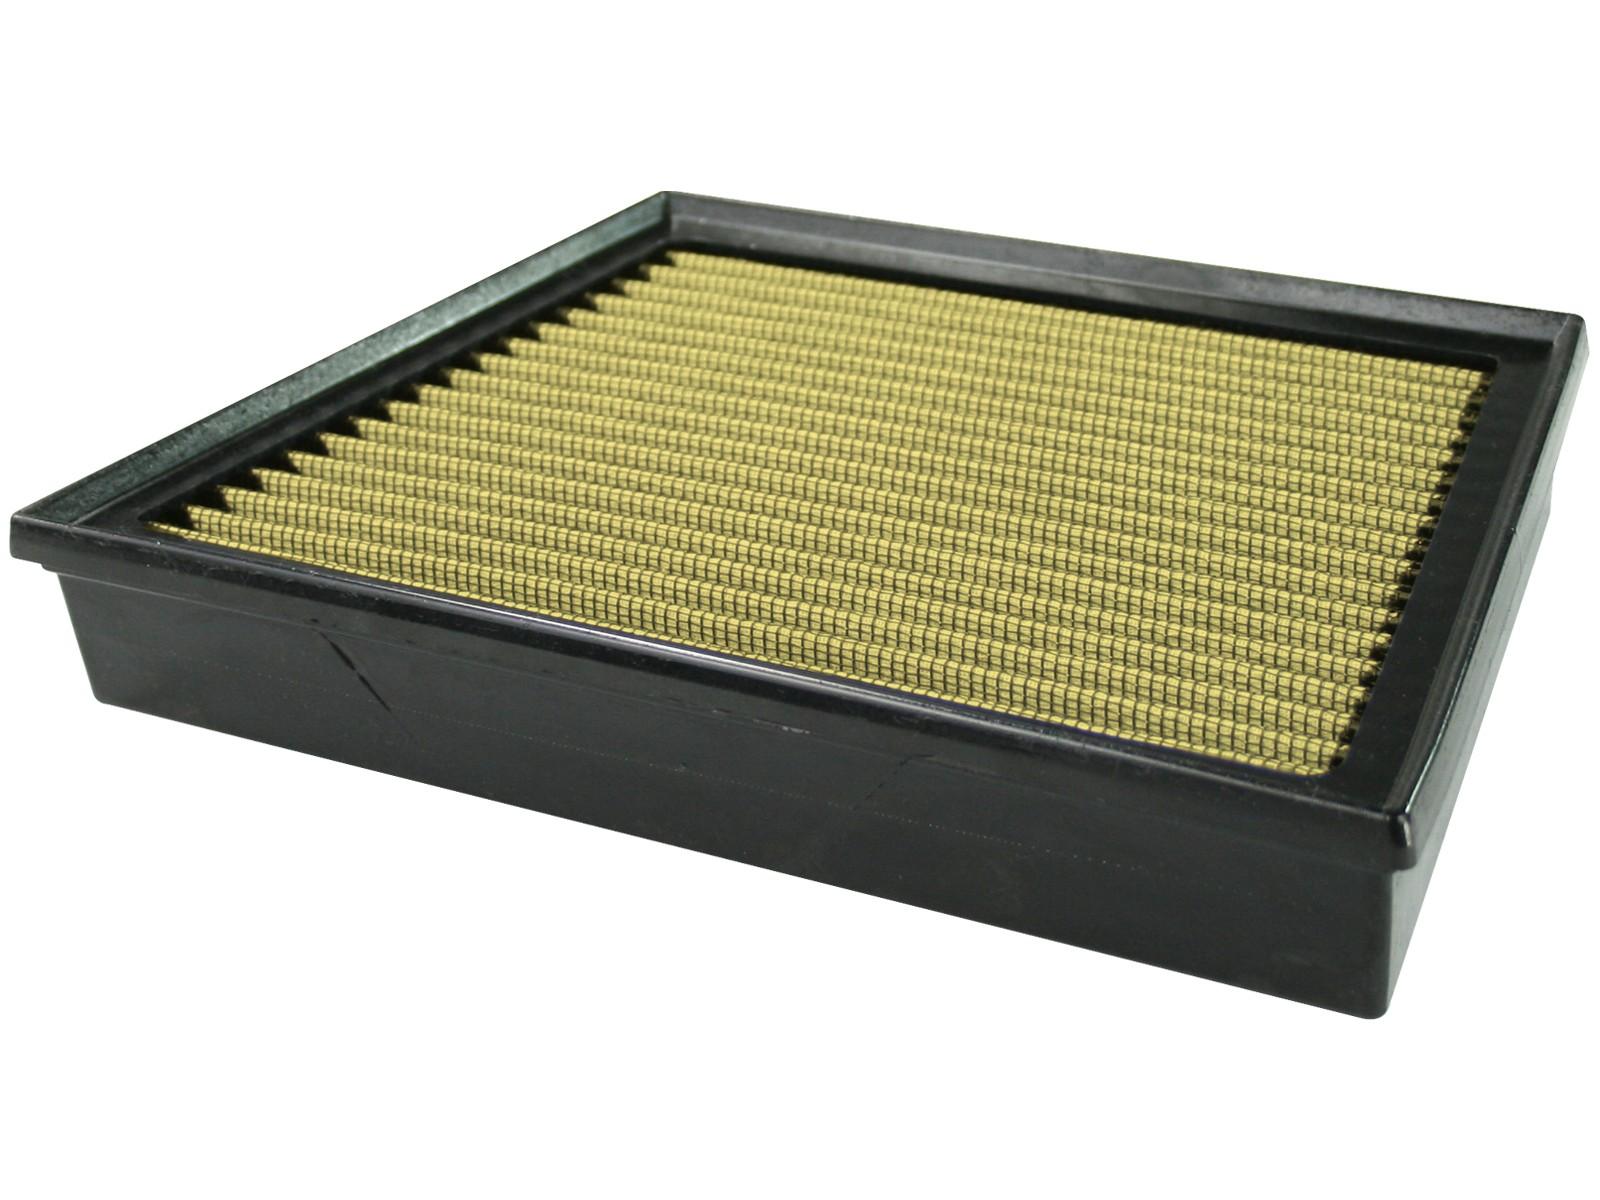 aFe POWER 73-10209 Magnum FLOW Pro GUARD7 Air Filter